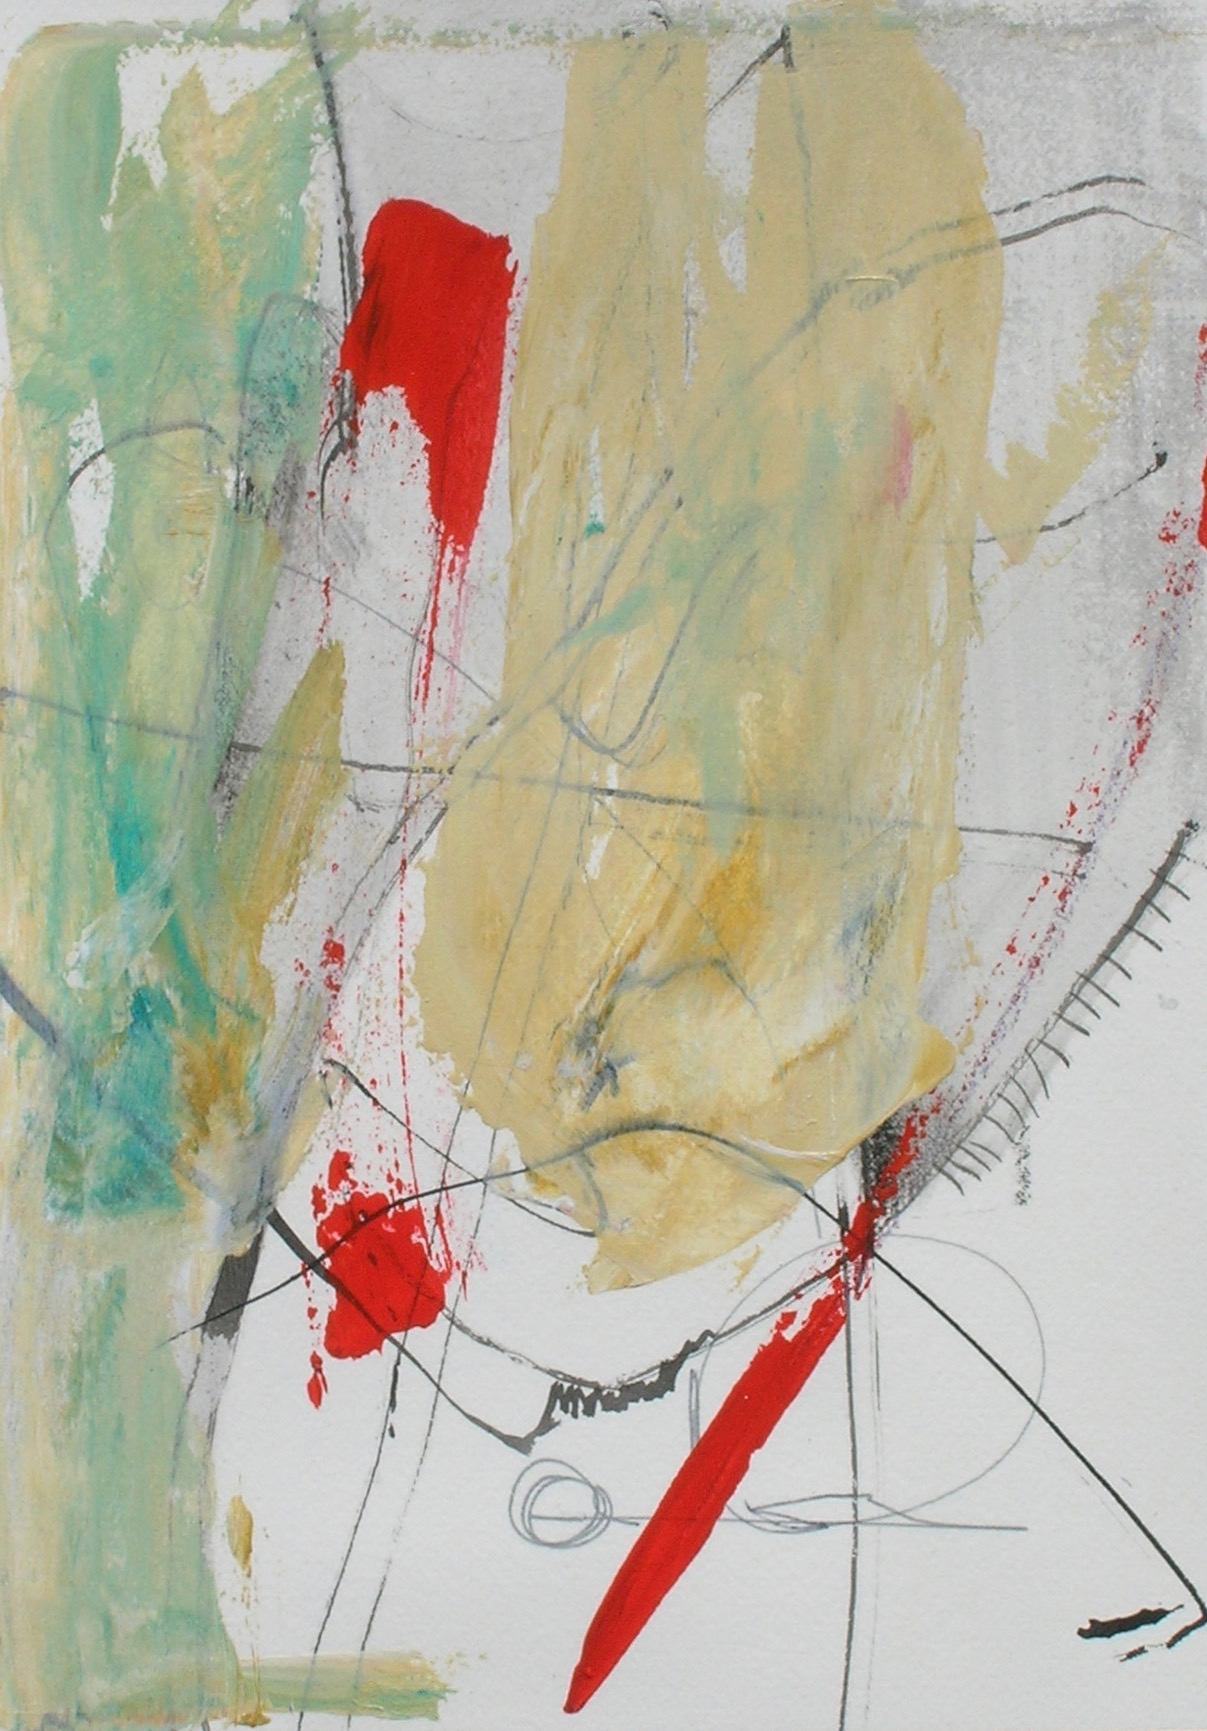 Untitled 1 2013